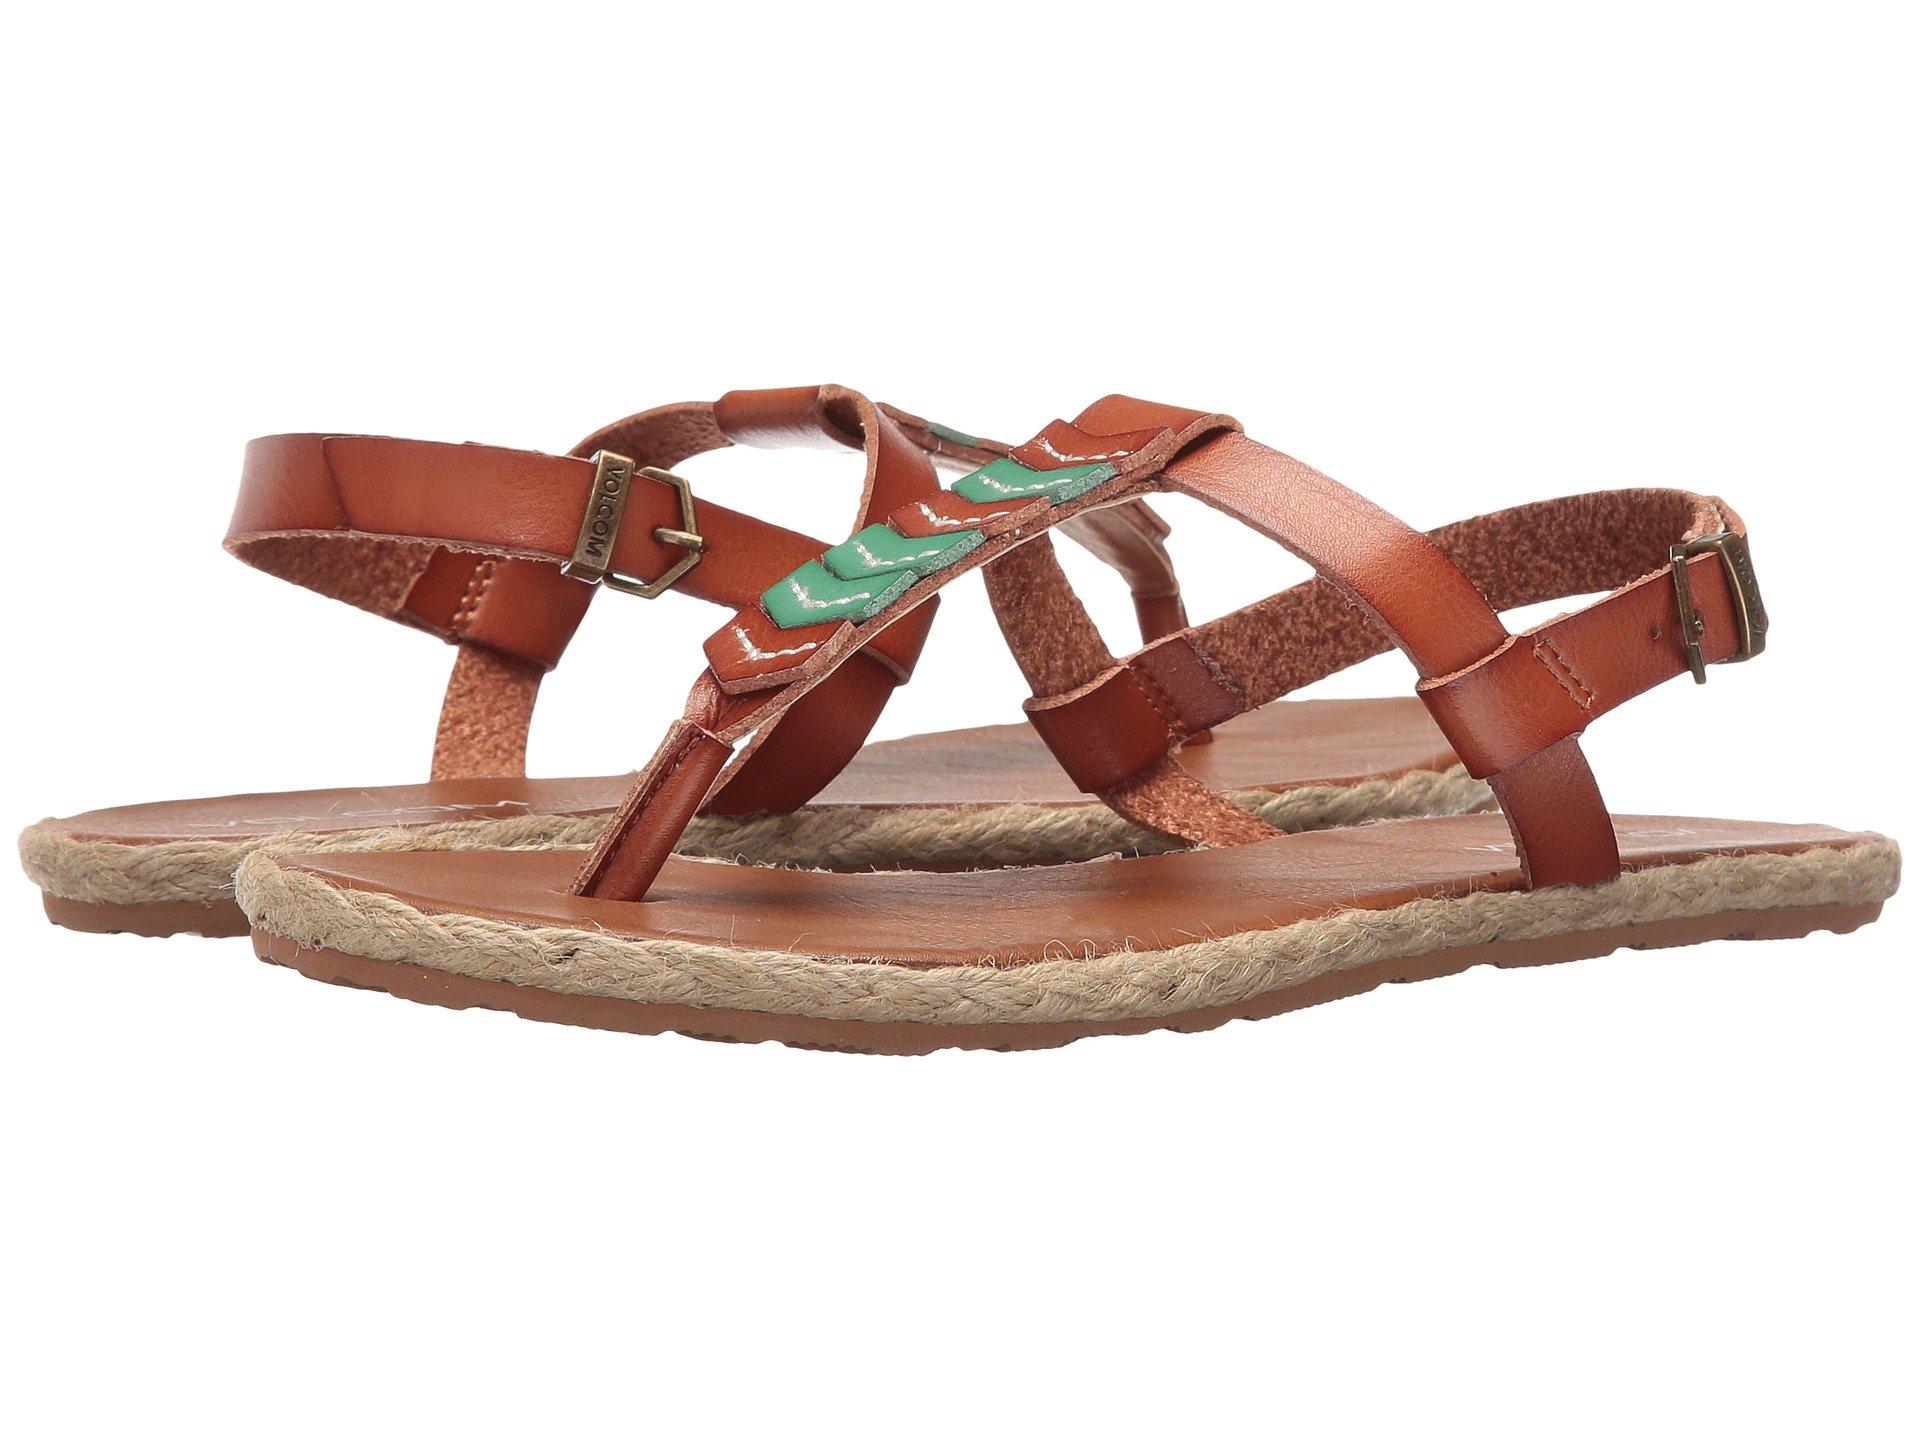 Sandalias para Mujer Volcom Trails  + Volcom en VeoyCompro.net